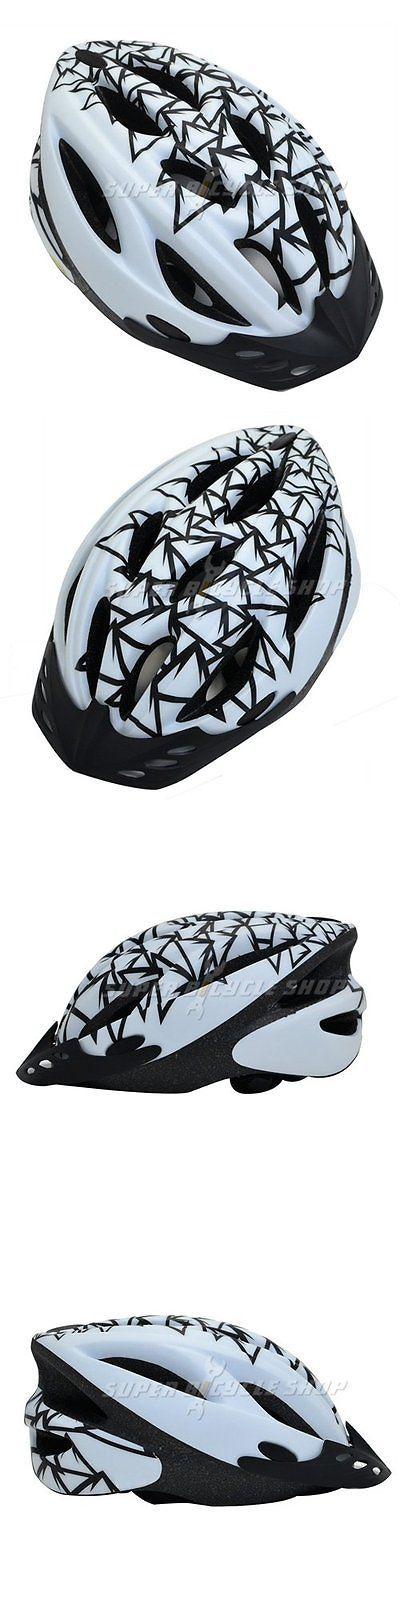 Helmet Accessories 177865: Fuji P9124 Bike Bicycle Durable Helmet 14 Vents, White X Black BUY IT NOW ONLY: $34.5